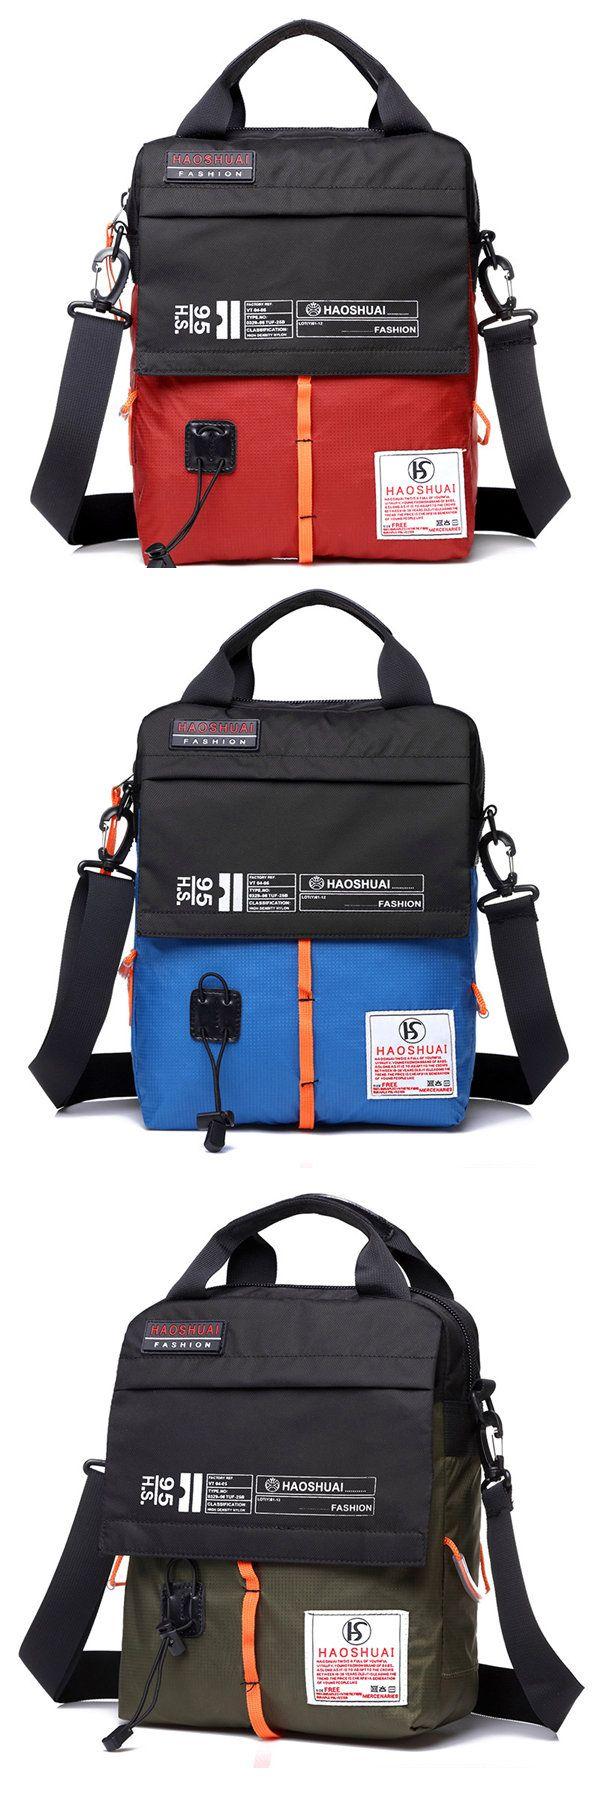 $21.12 Nylon Waterproof Assorted Colors Portable Shoulder Bags Crossbody Bags For Men